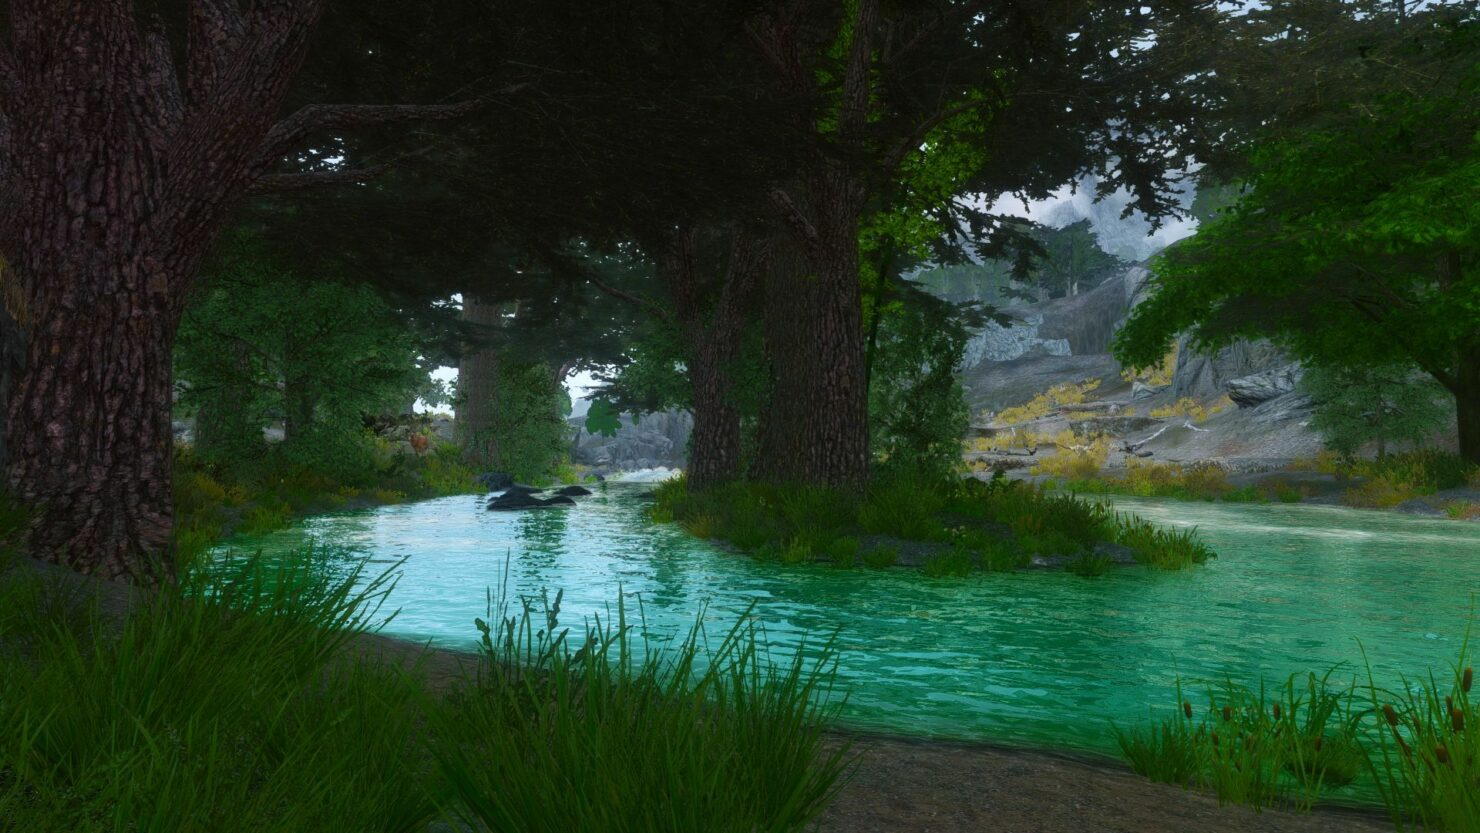 elder-scrolls-v-skyrim-legendary-edition-project-rainforest-mod-update-3